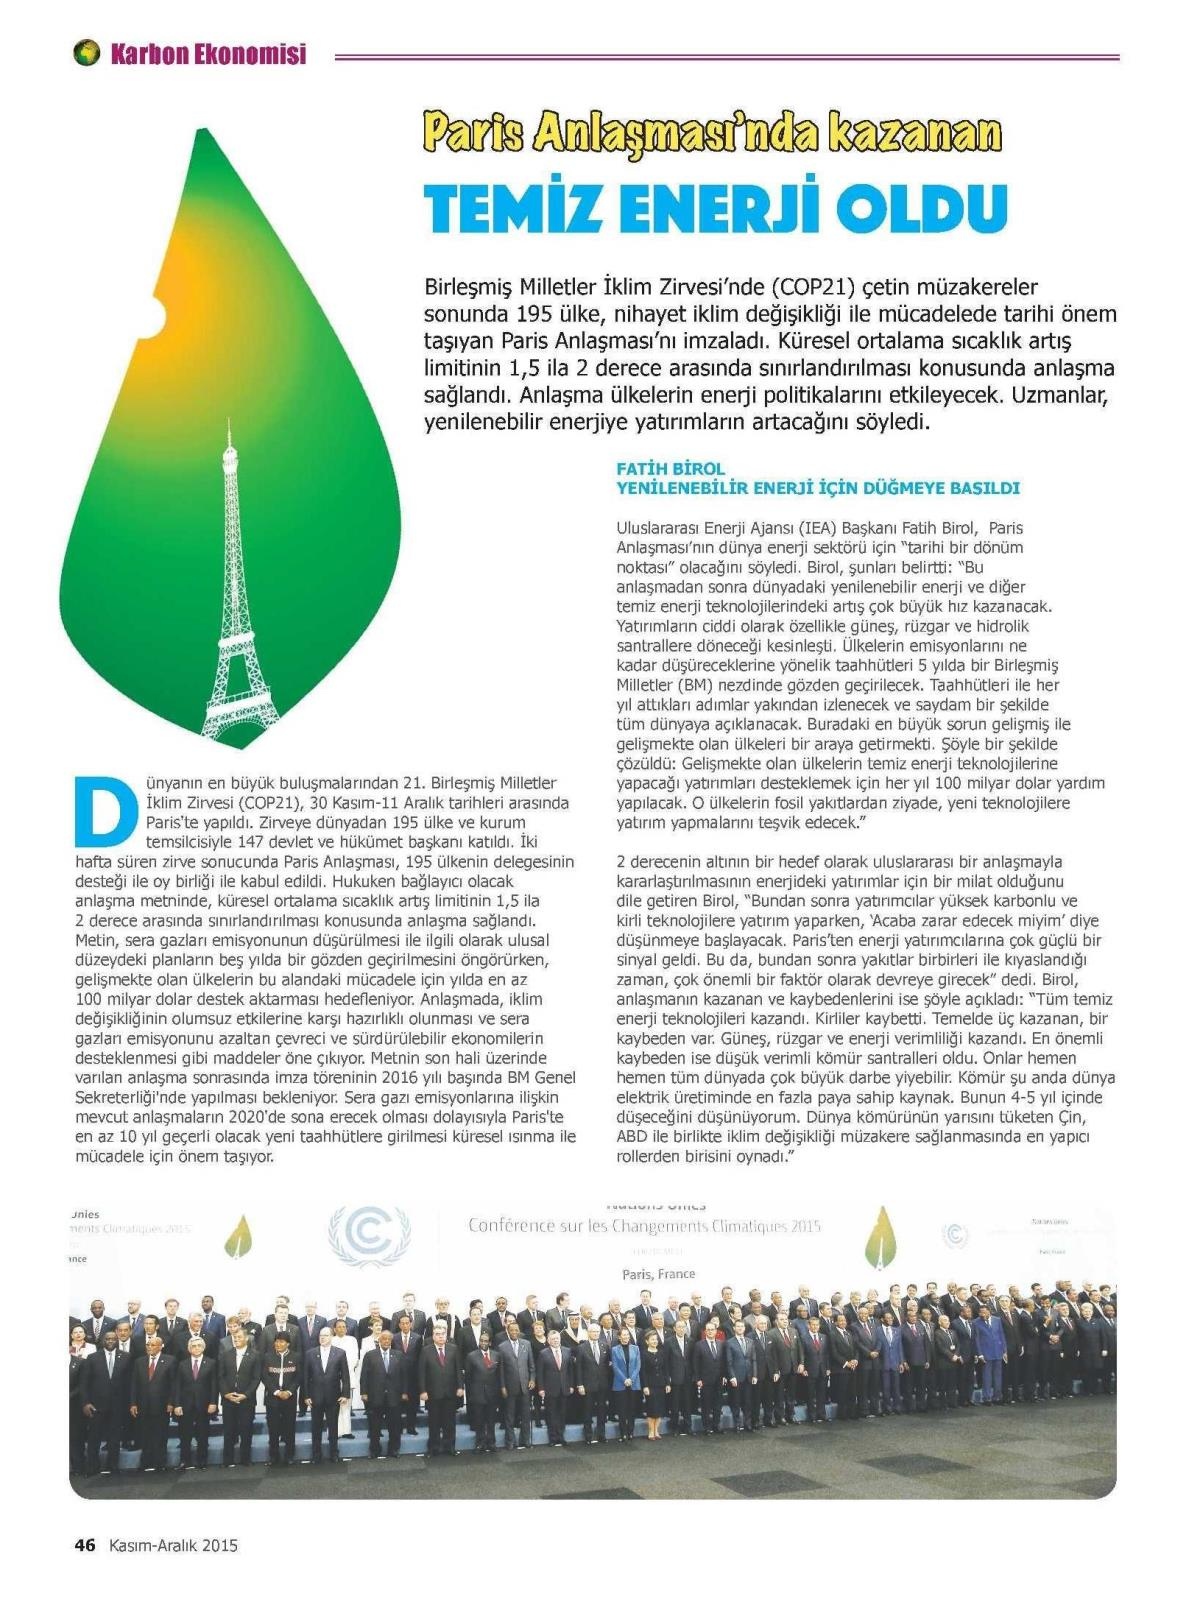 Energy World 01.11.2015 s46